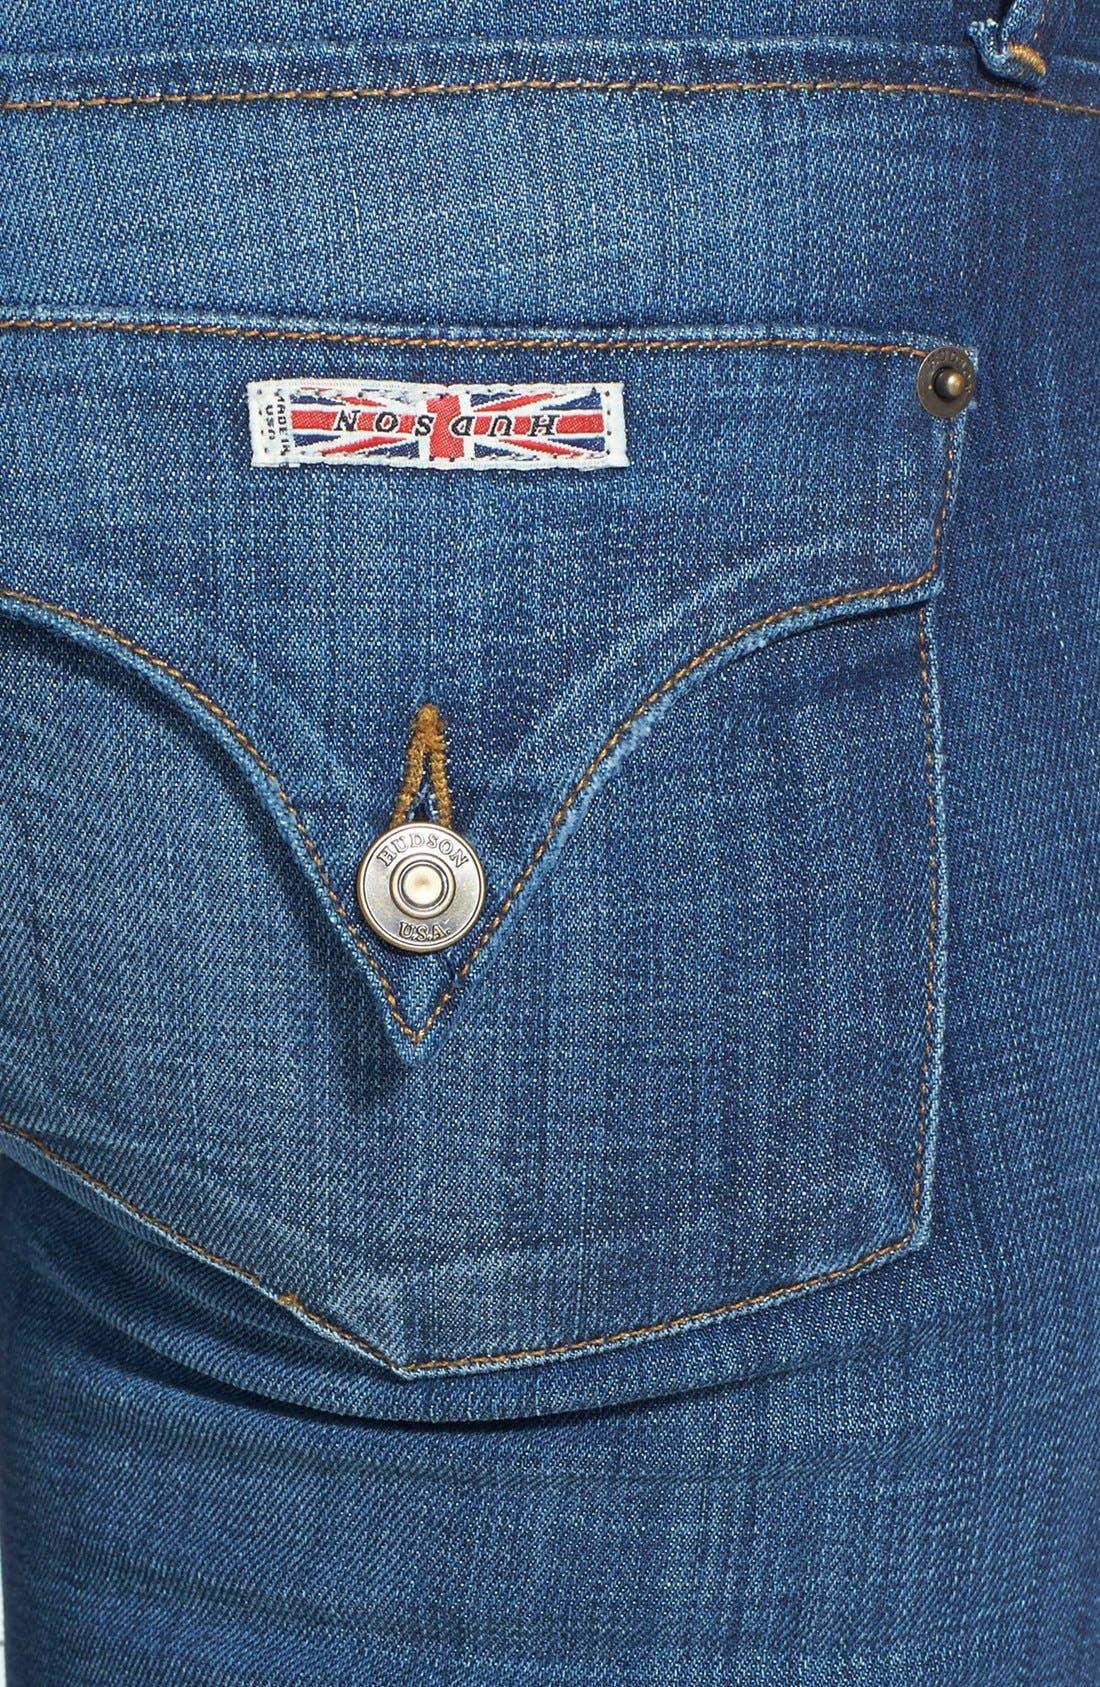 Alternate Image 3  - Hudson Jeans 'Collin' Skinny Jeans (Saville)